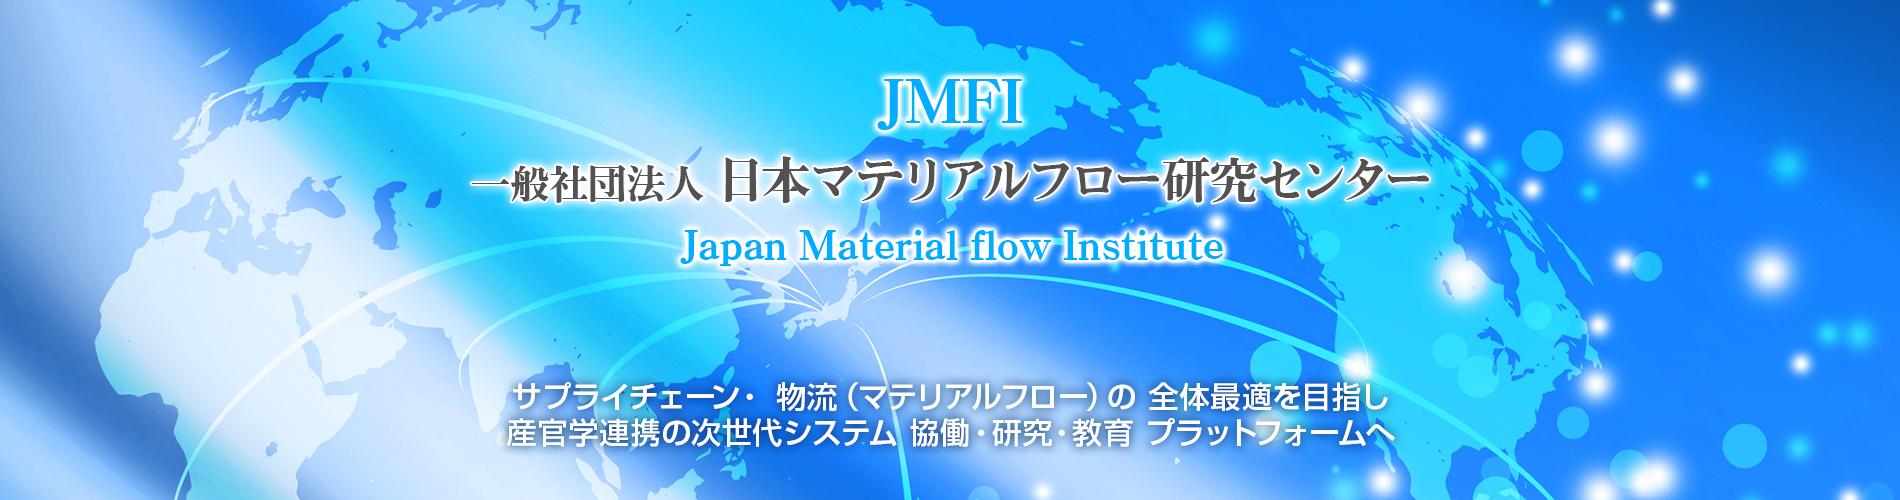 [JMFI]一般社団法人日本マテリアルフロー研究センター